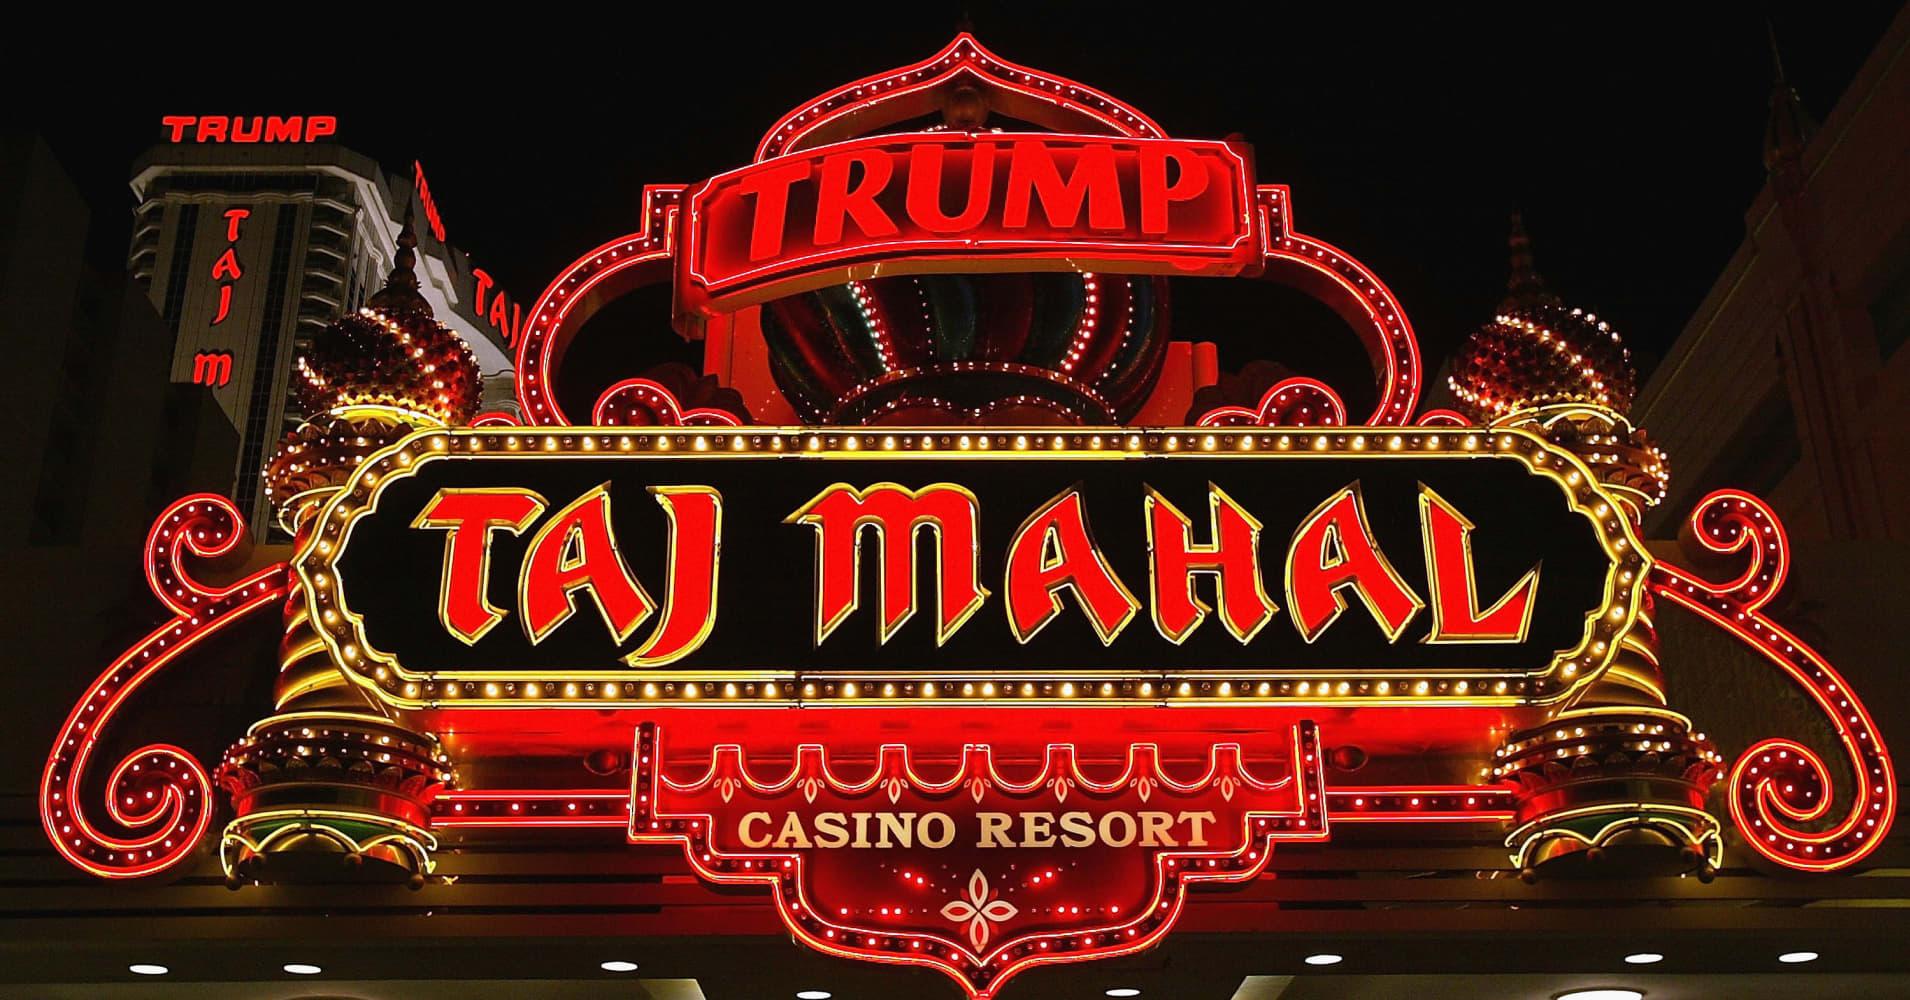 Trump taj mahal closes after 26 years 5th casino casualty for Taj mahal online casino